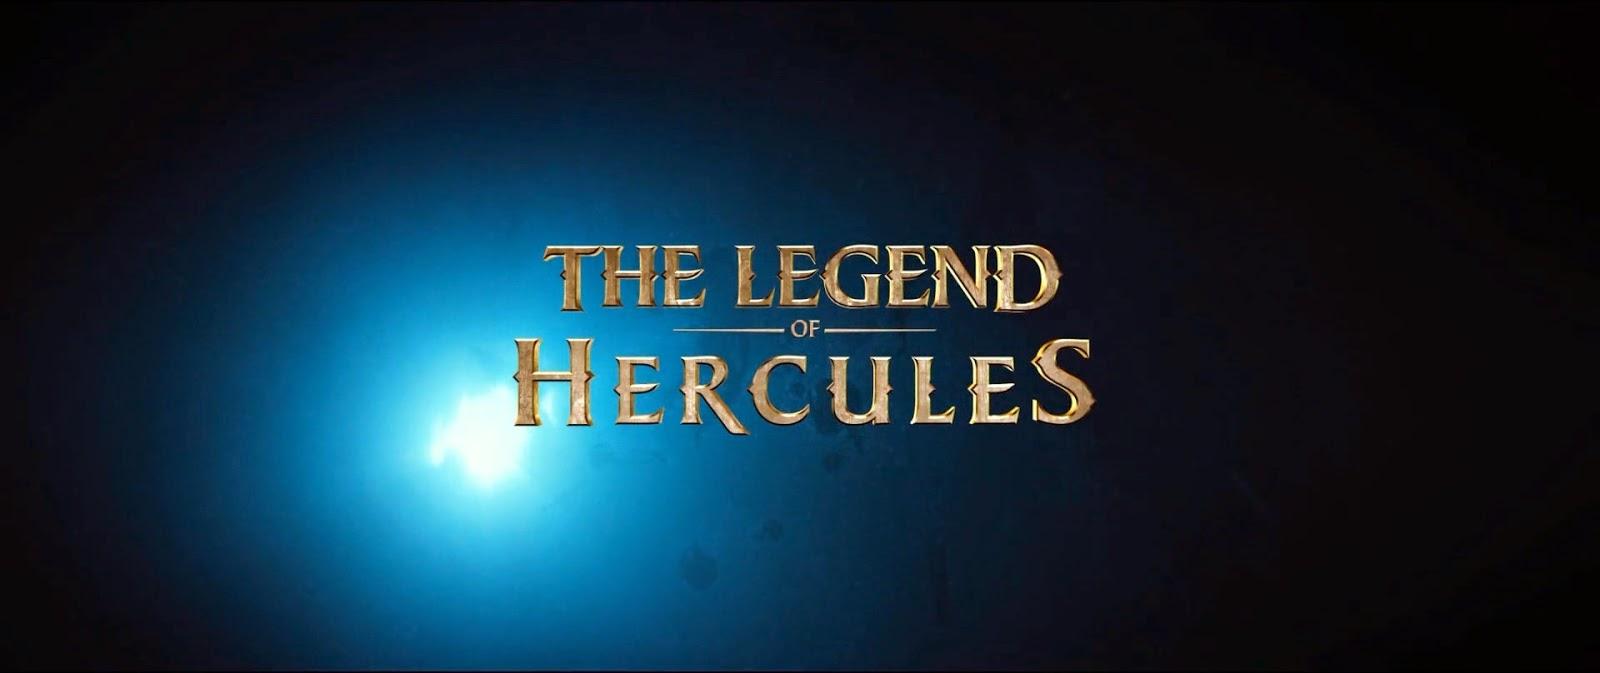 The Legend of Hercules (2014) S2 s The Legend of Hercules (2014)